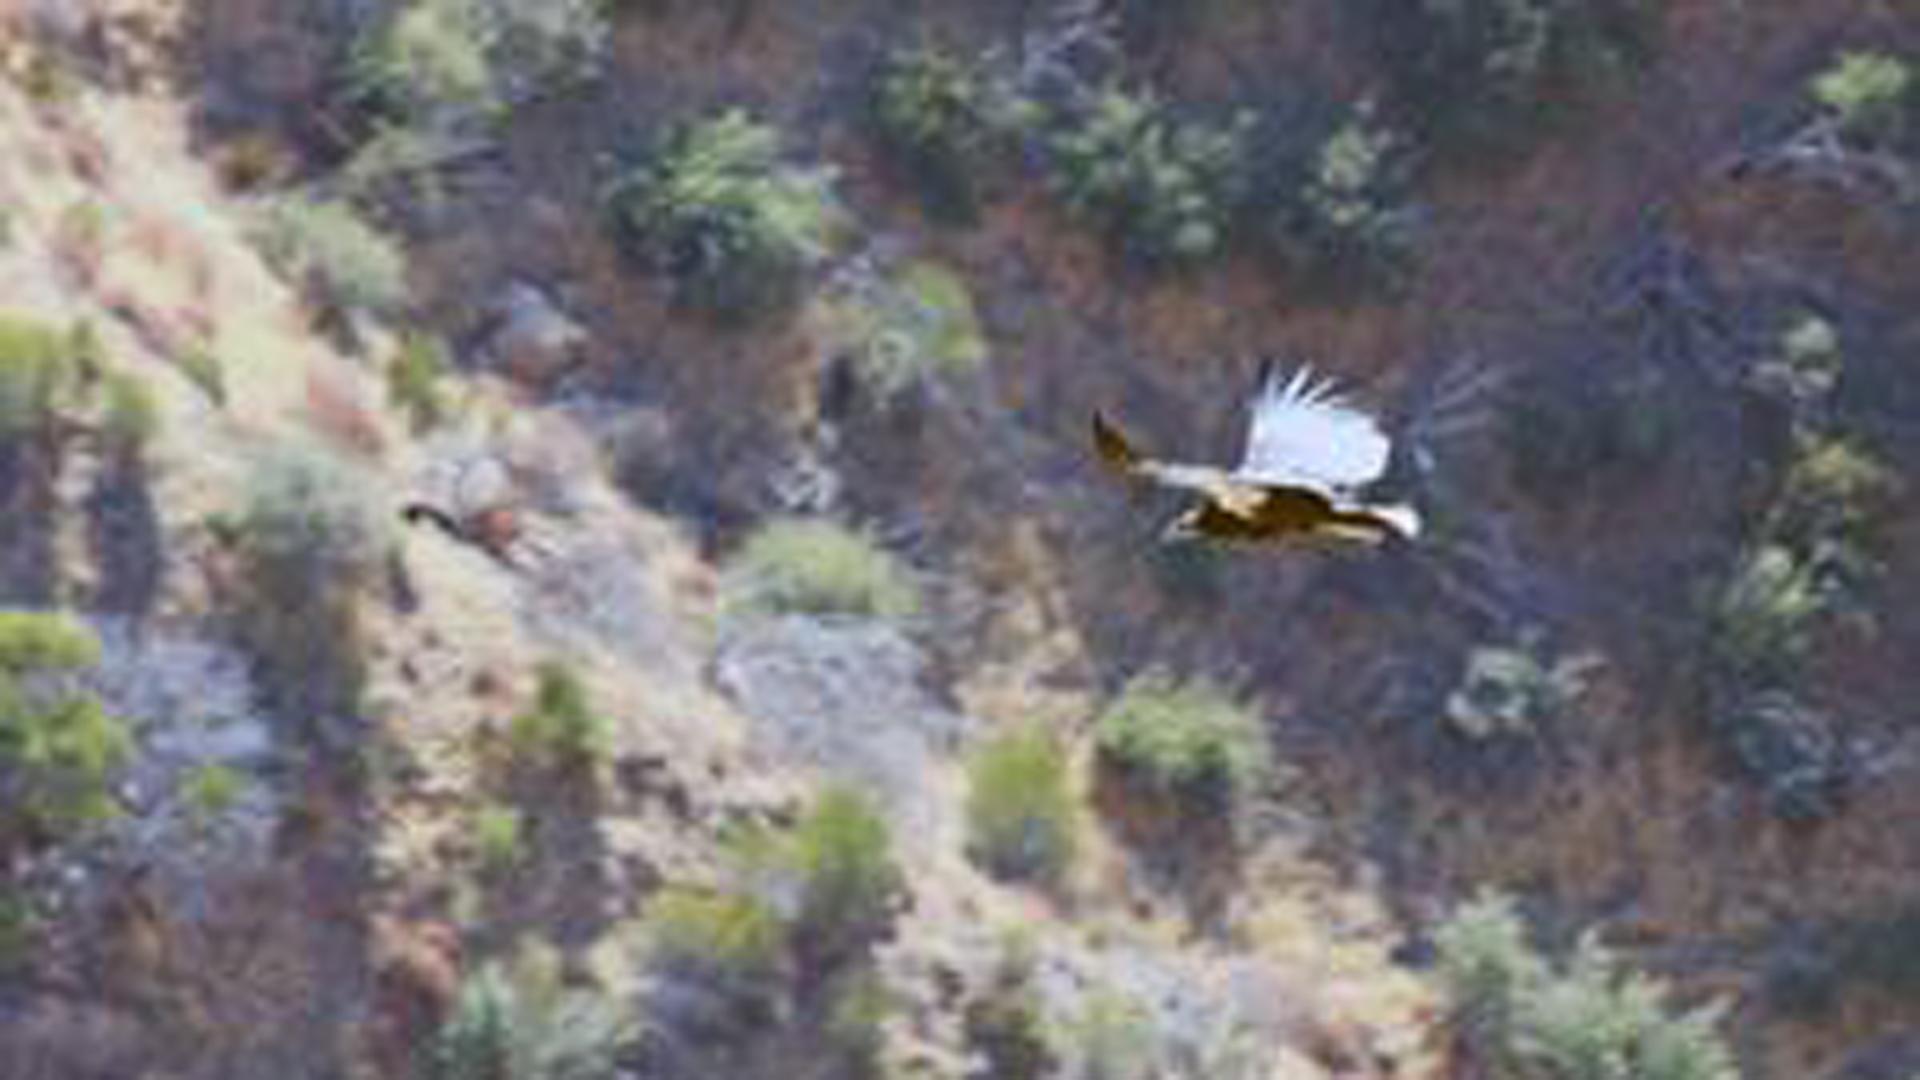 California condor 933 successfully fledges in Santa Barbara County. (Credit: Santa Barbara Zoo via U.S. Fish and Wildlife Service)